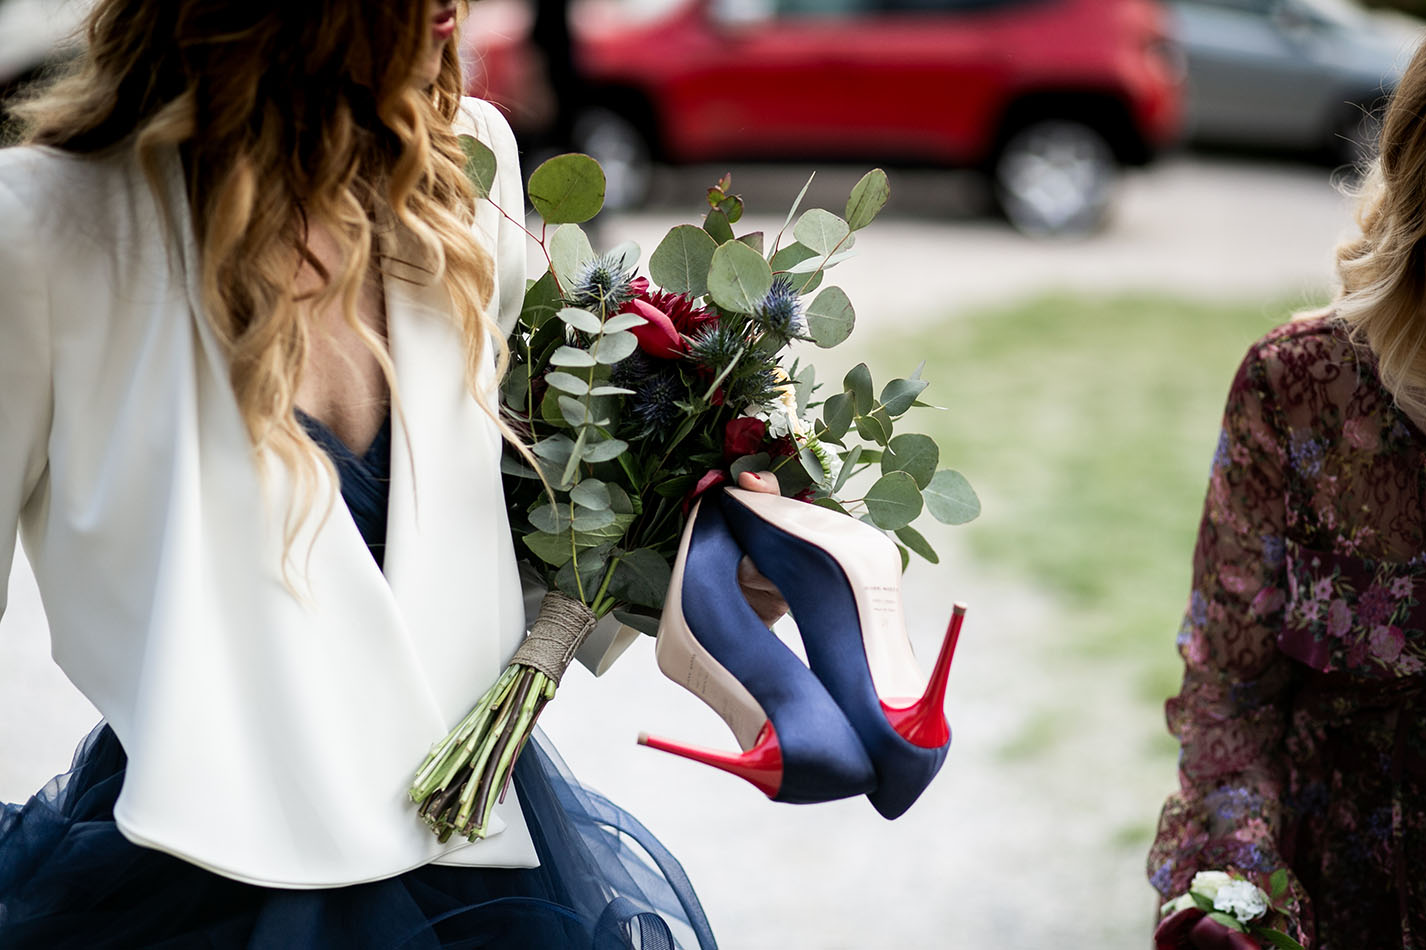 LM06-scarpe-sposa